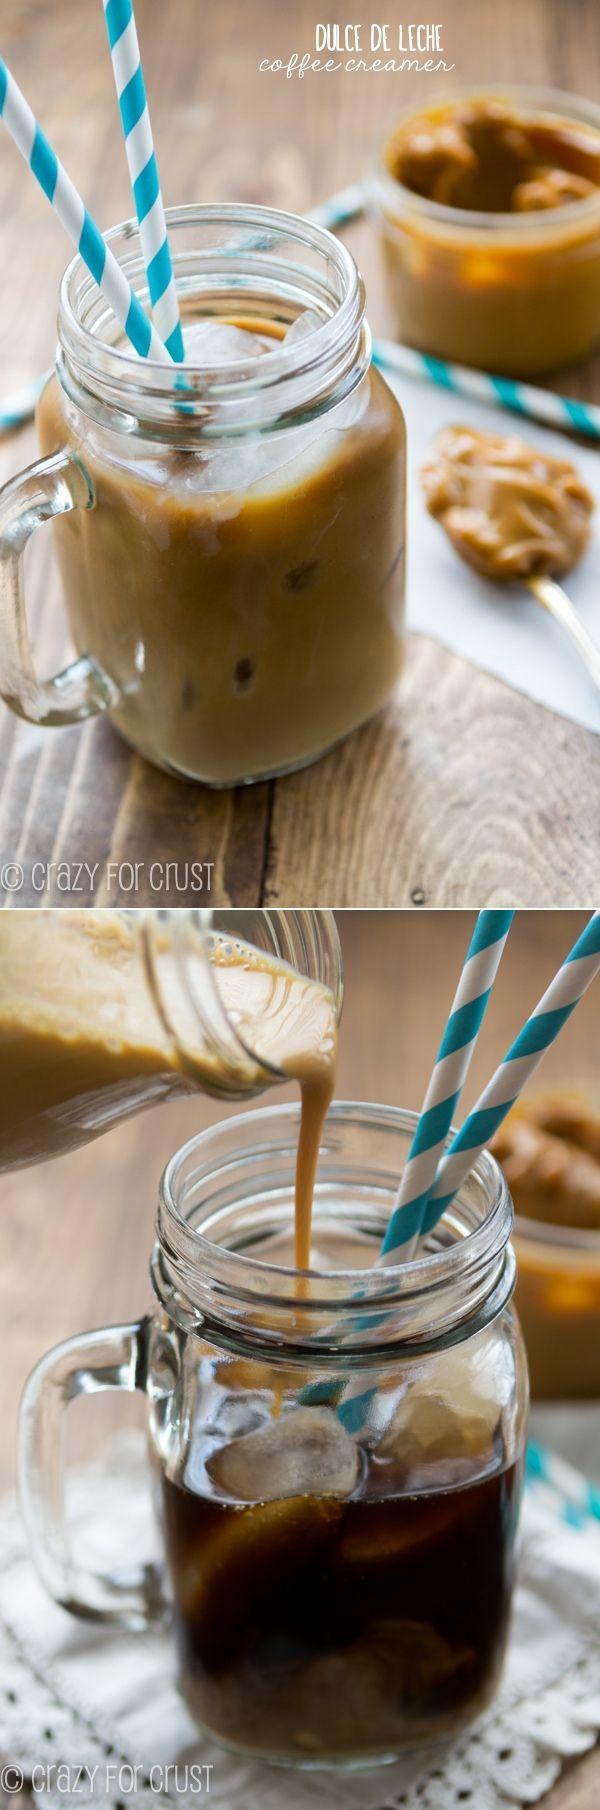 Dulce de Leche Coffee Creamer - only 2 ingredients!Coffee Creamer, 2 ...